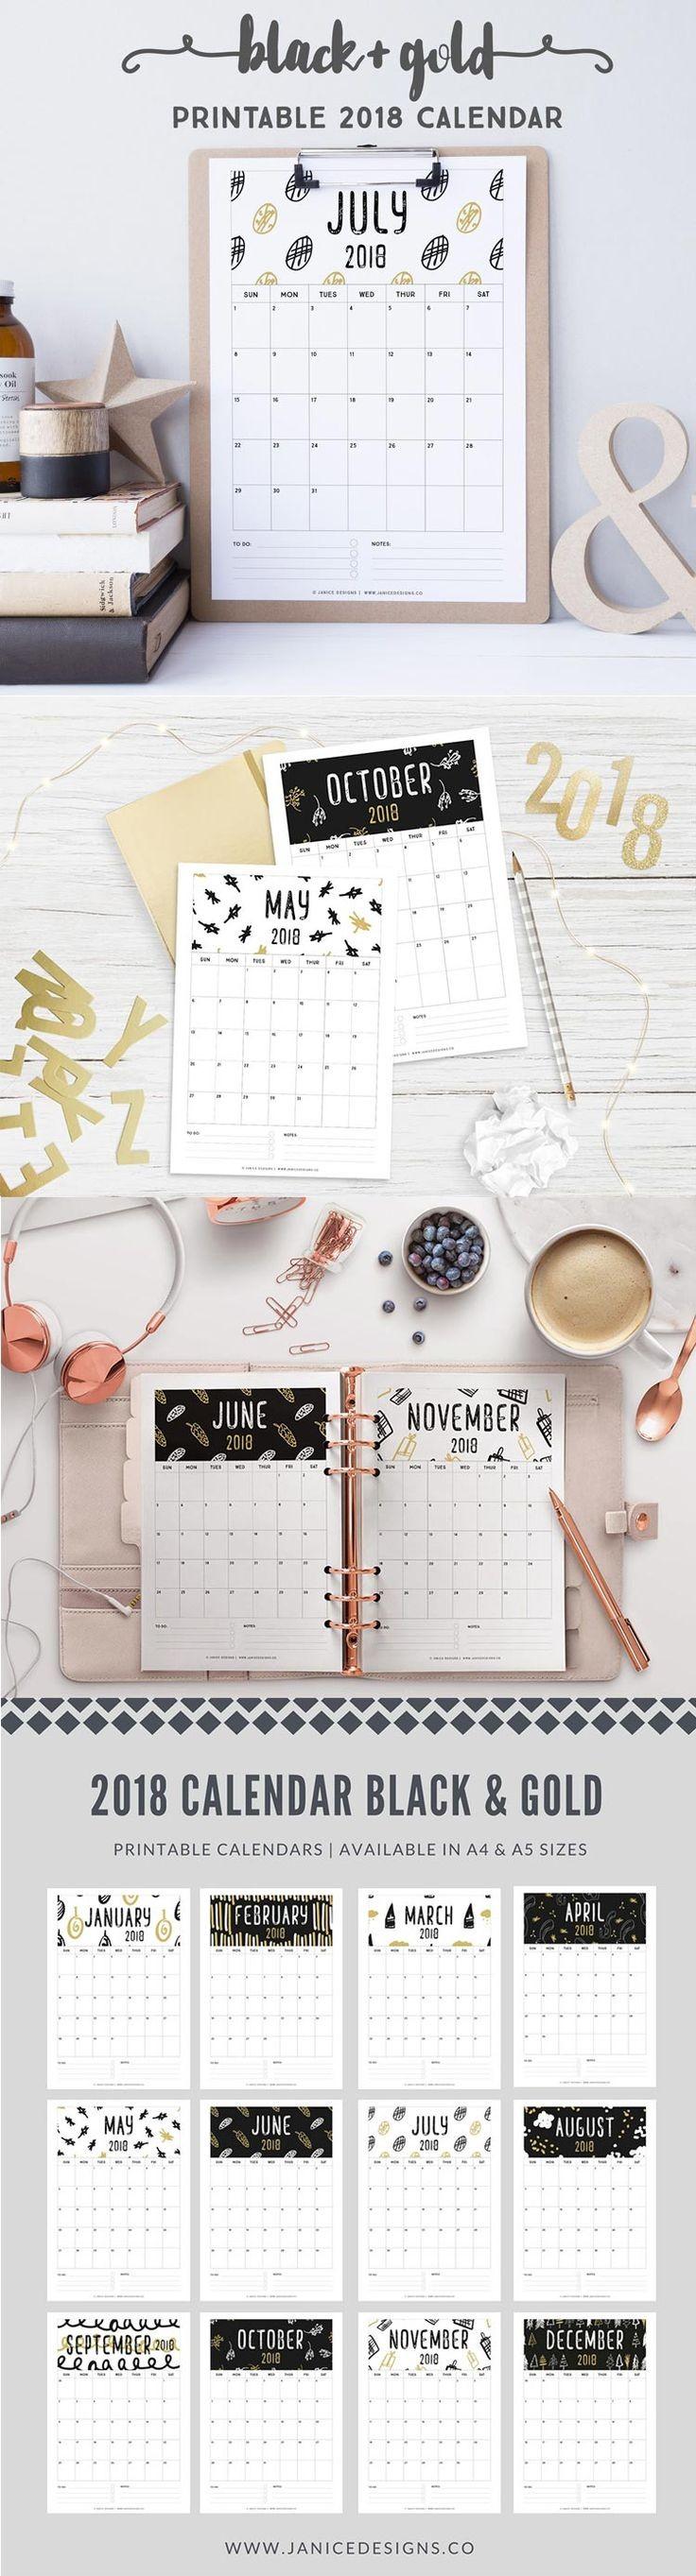 Calendario Para Imprimir 2019 Tumblr Más Arriba-a-fecha 81 Best каРендари Images On Pinterest